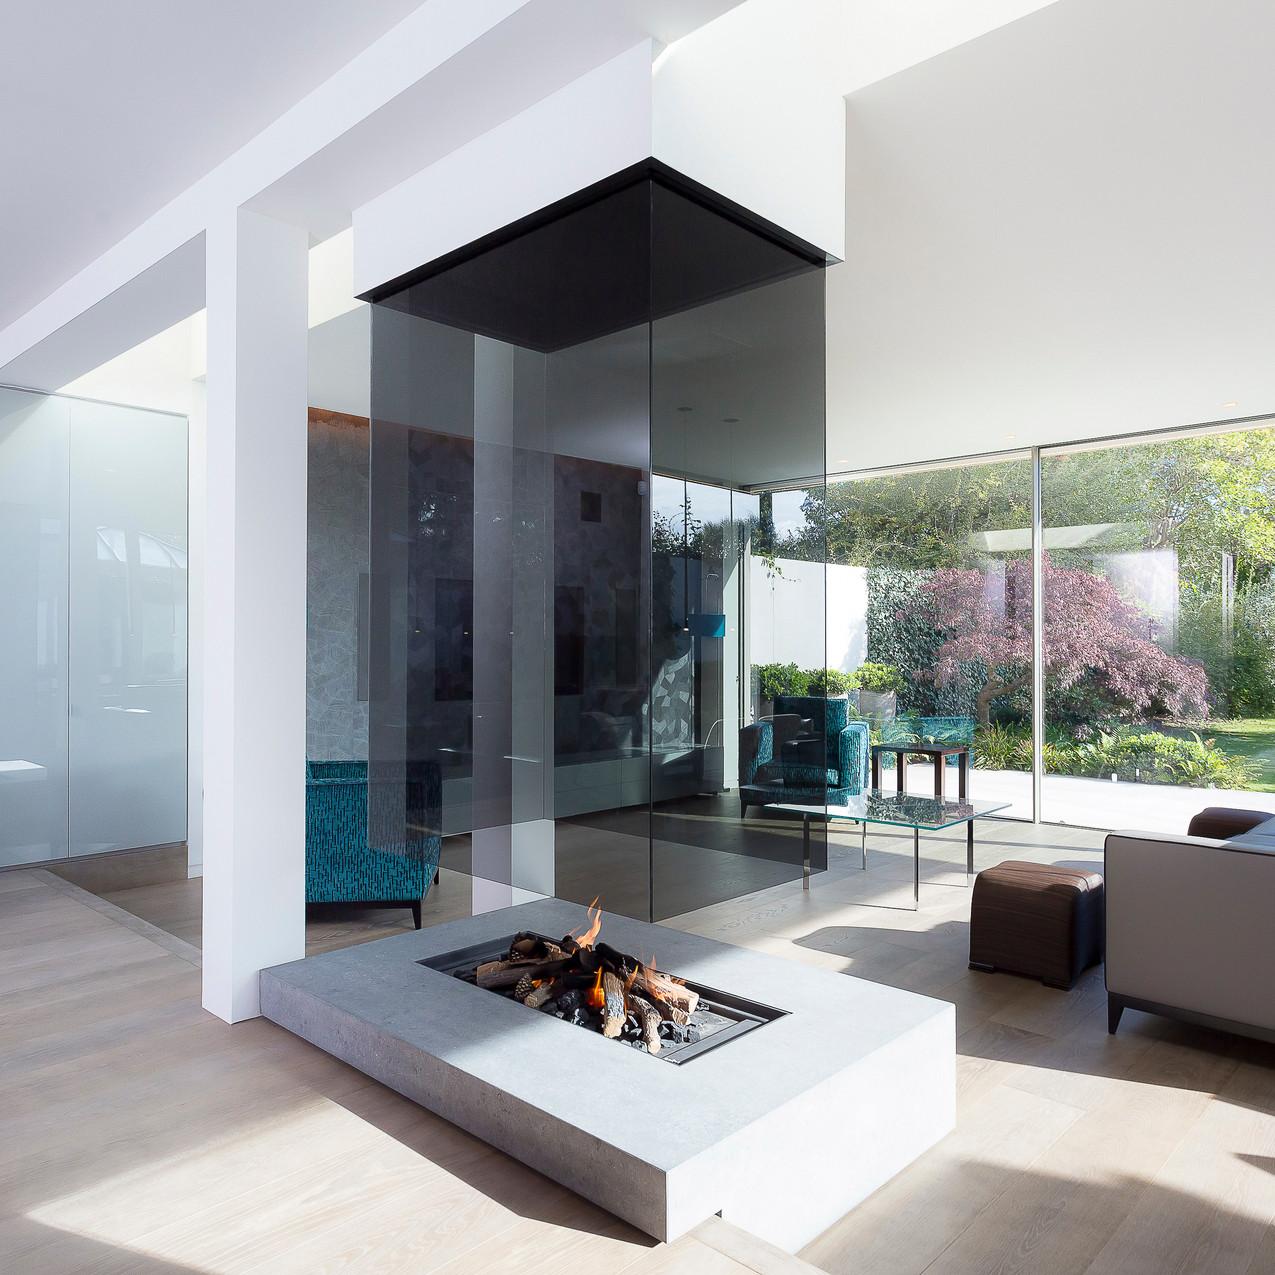 Fire Living Room, Shepherd's Bush, London